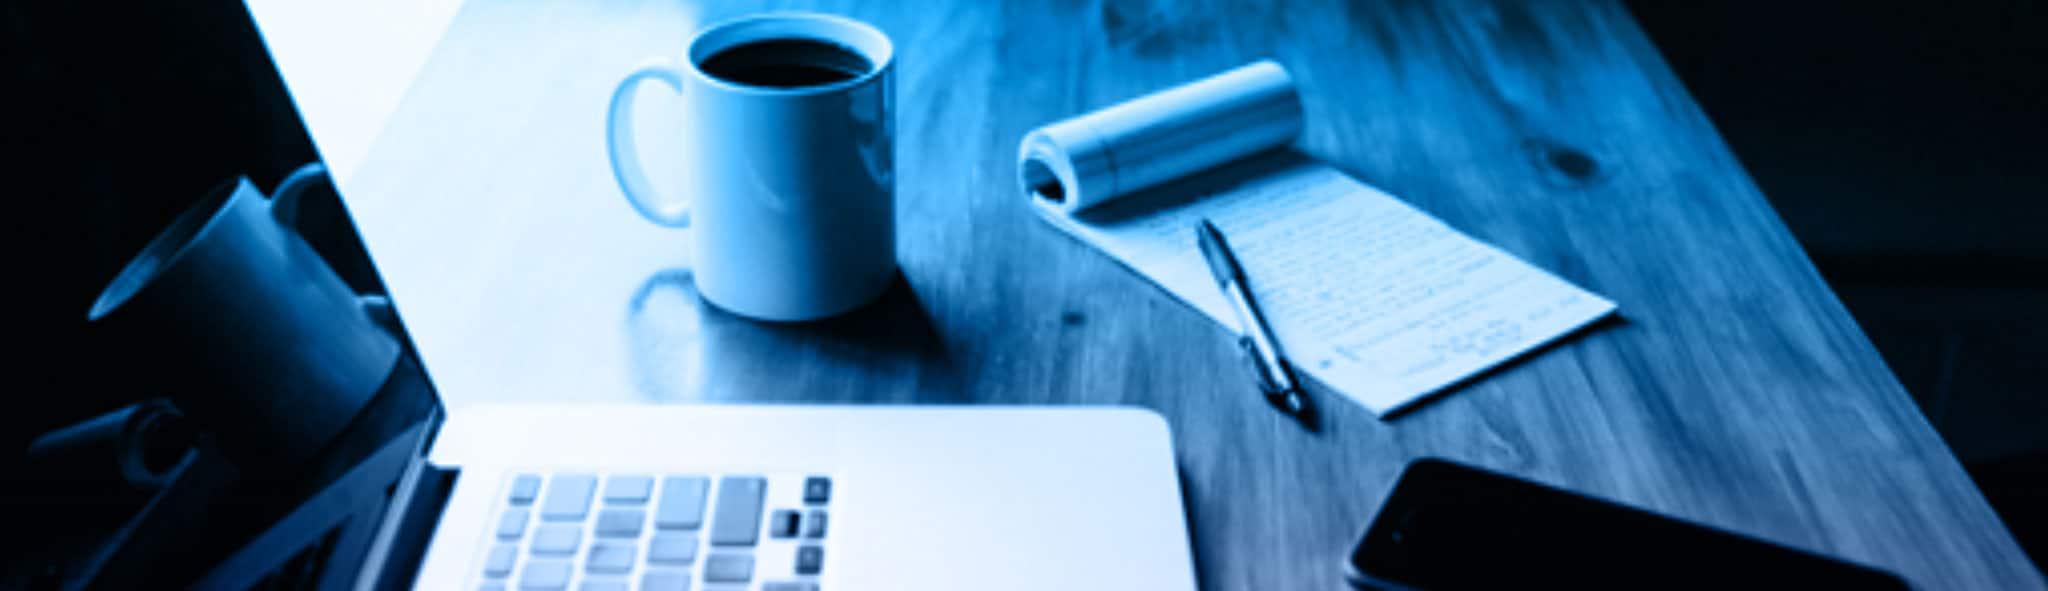 Digital conveniences in a remote work environment